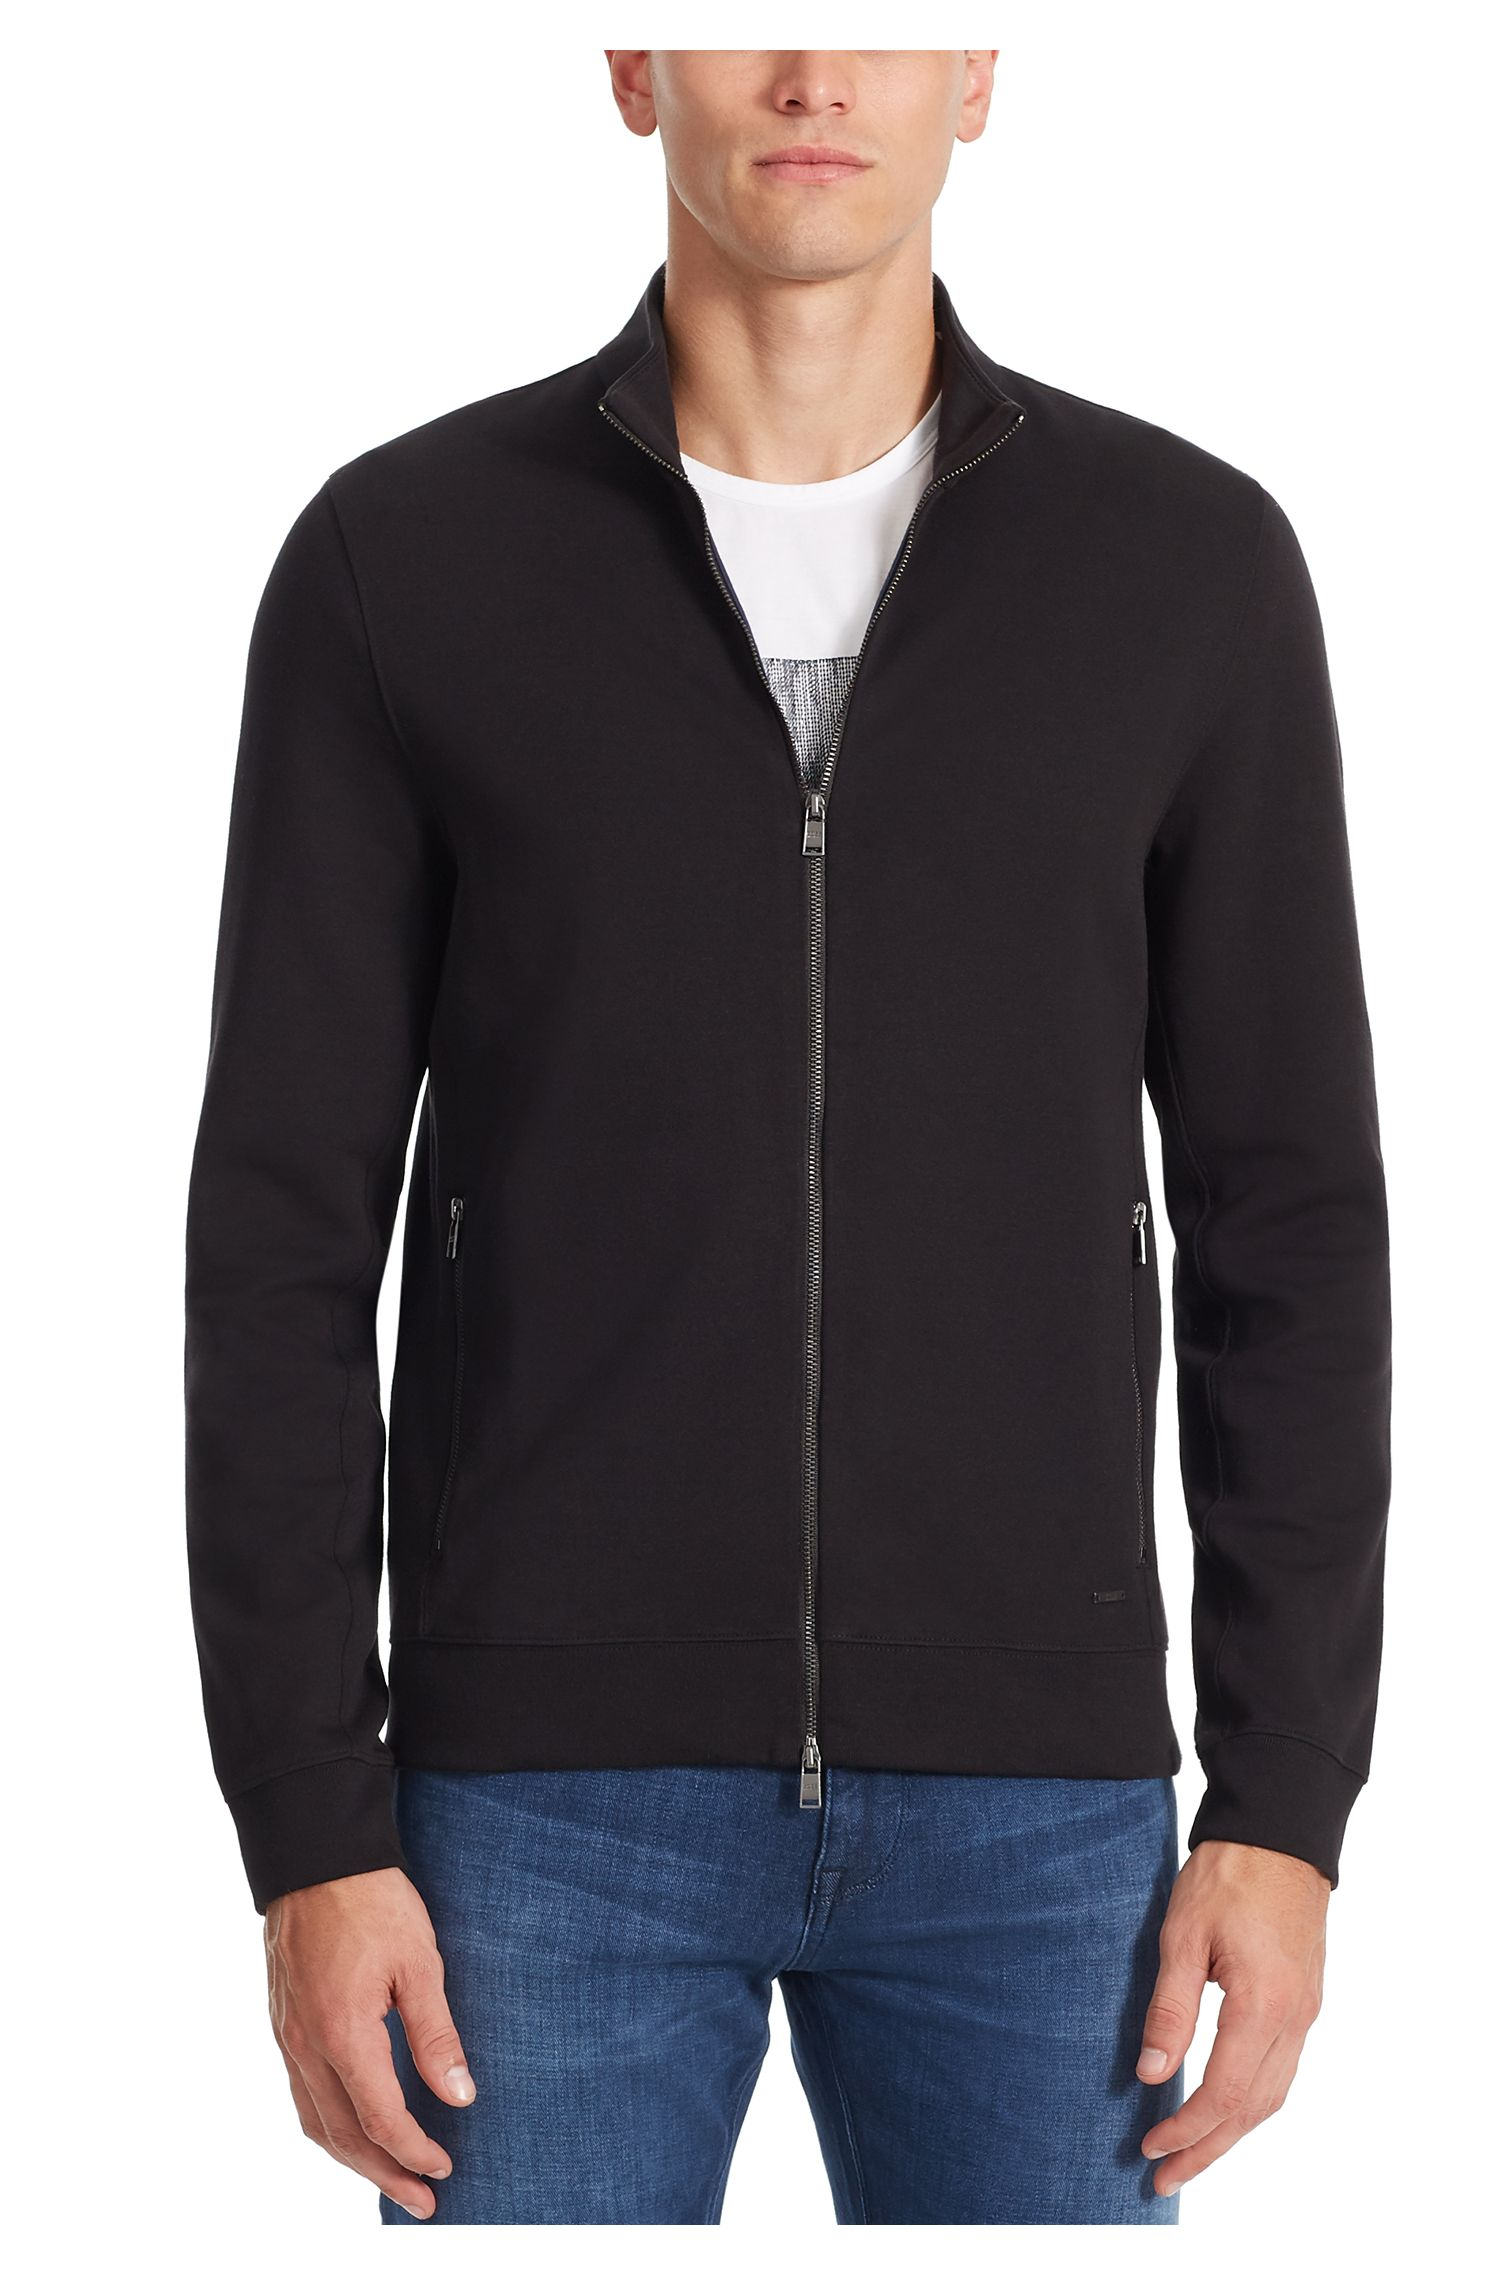 Cotton Sweater Jacket | Soule